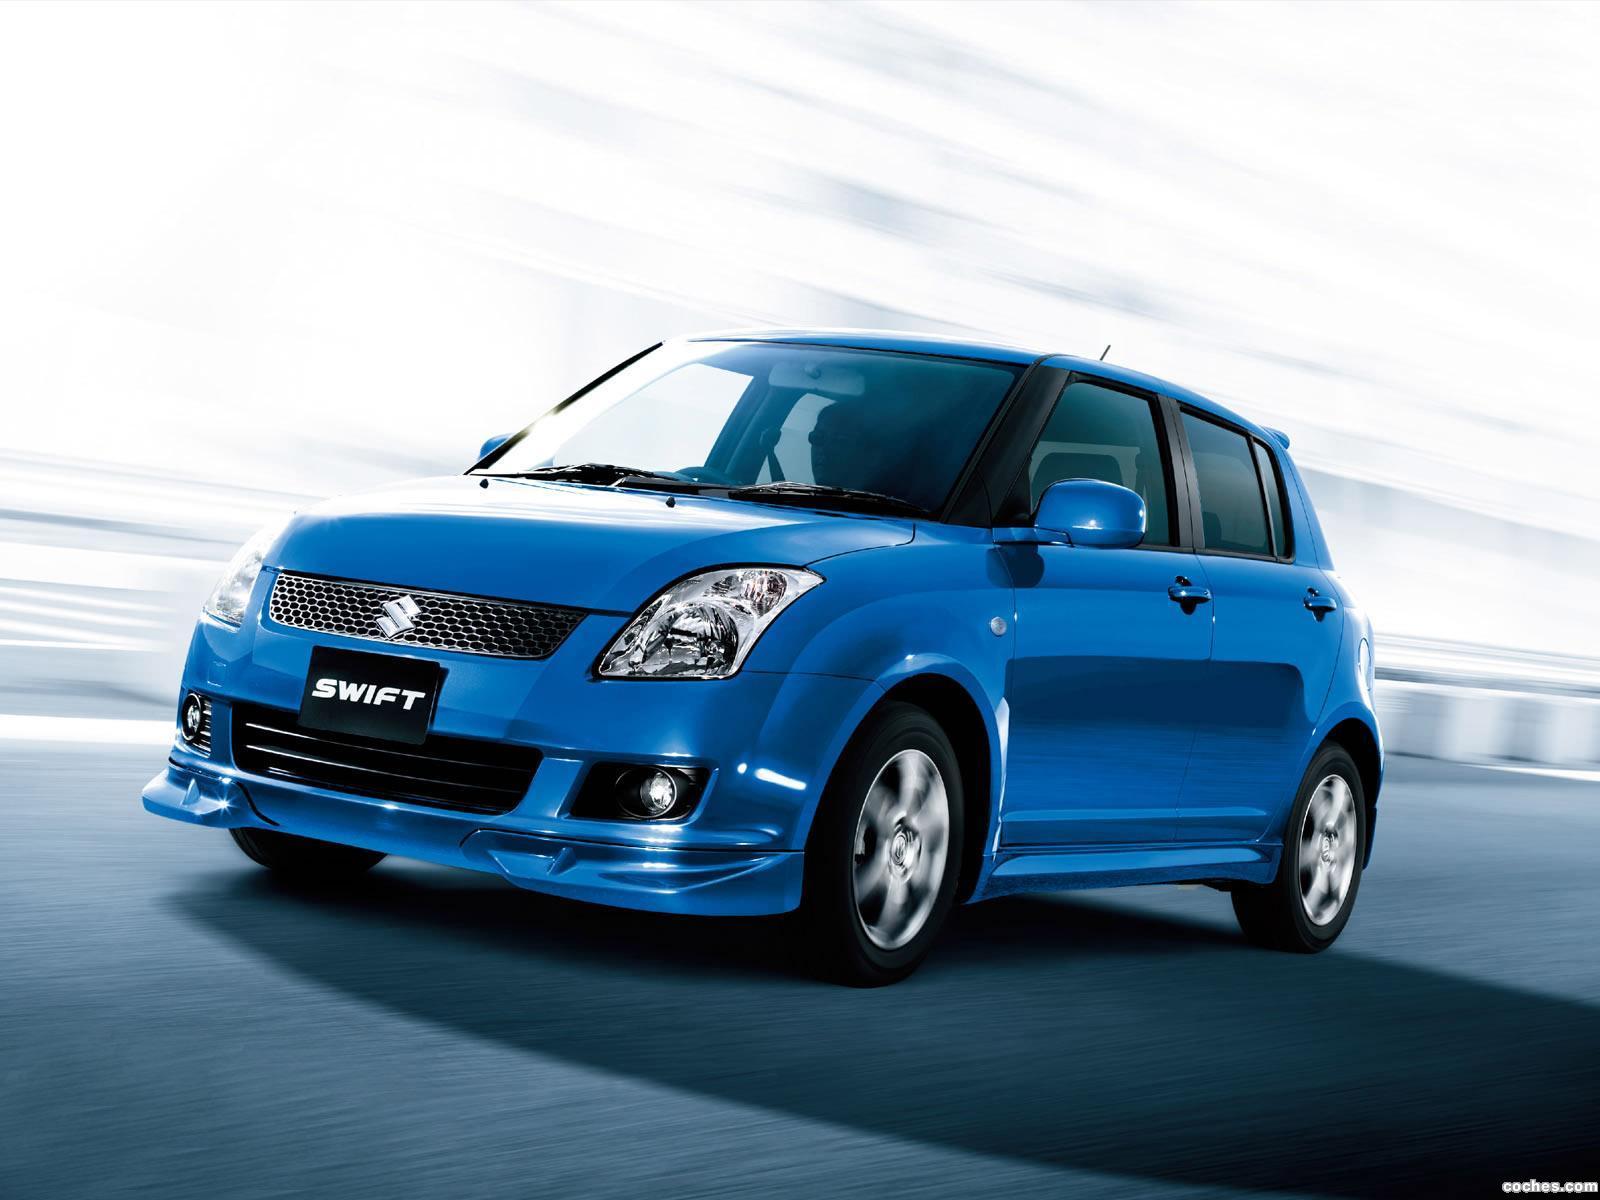 Foto 0 de Suzuki Swift XG Aero 2008